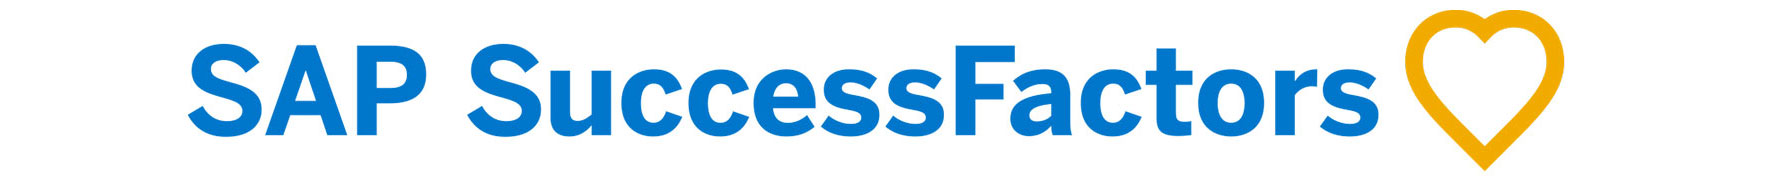 CiGen-robotic-process-automation-RPA-Australia-SAP-Success-Factors.jpg